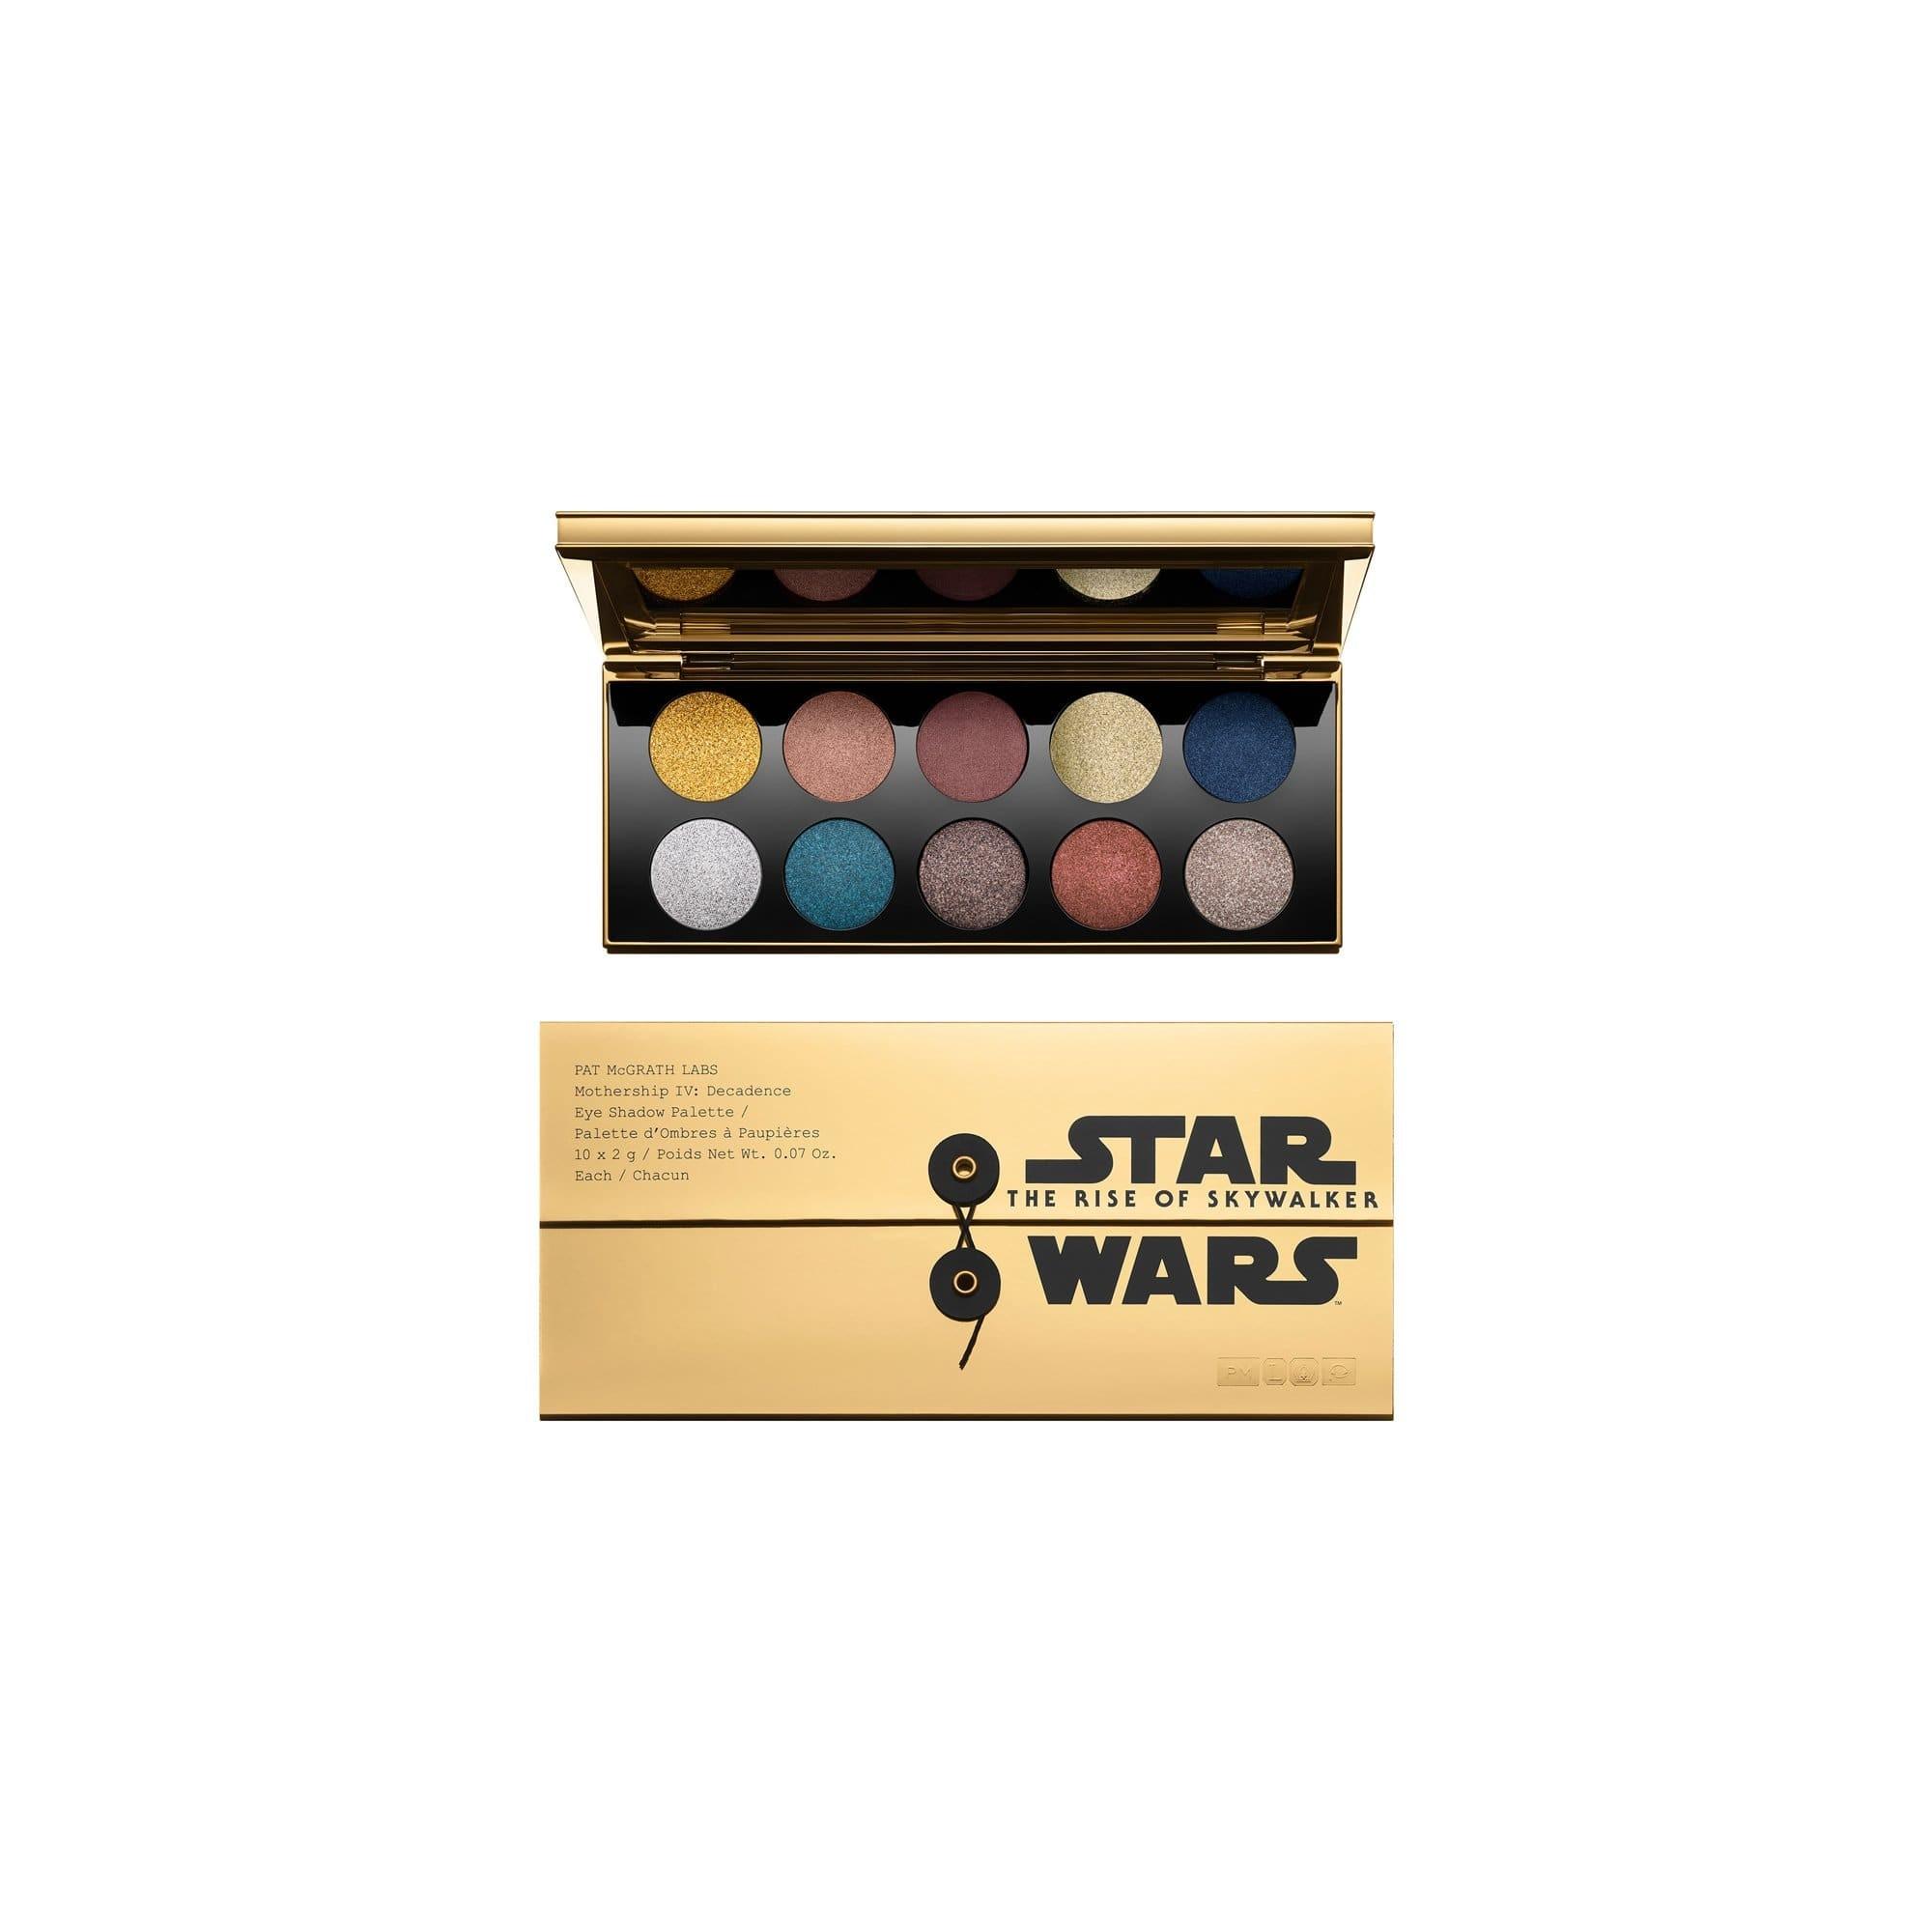 Pat McGrath Labs x Star Wars Mothership IV Decadence eye shadow palette